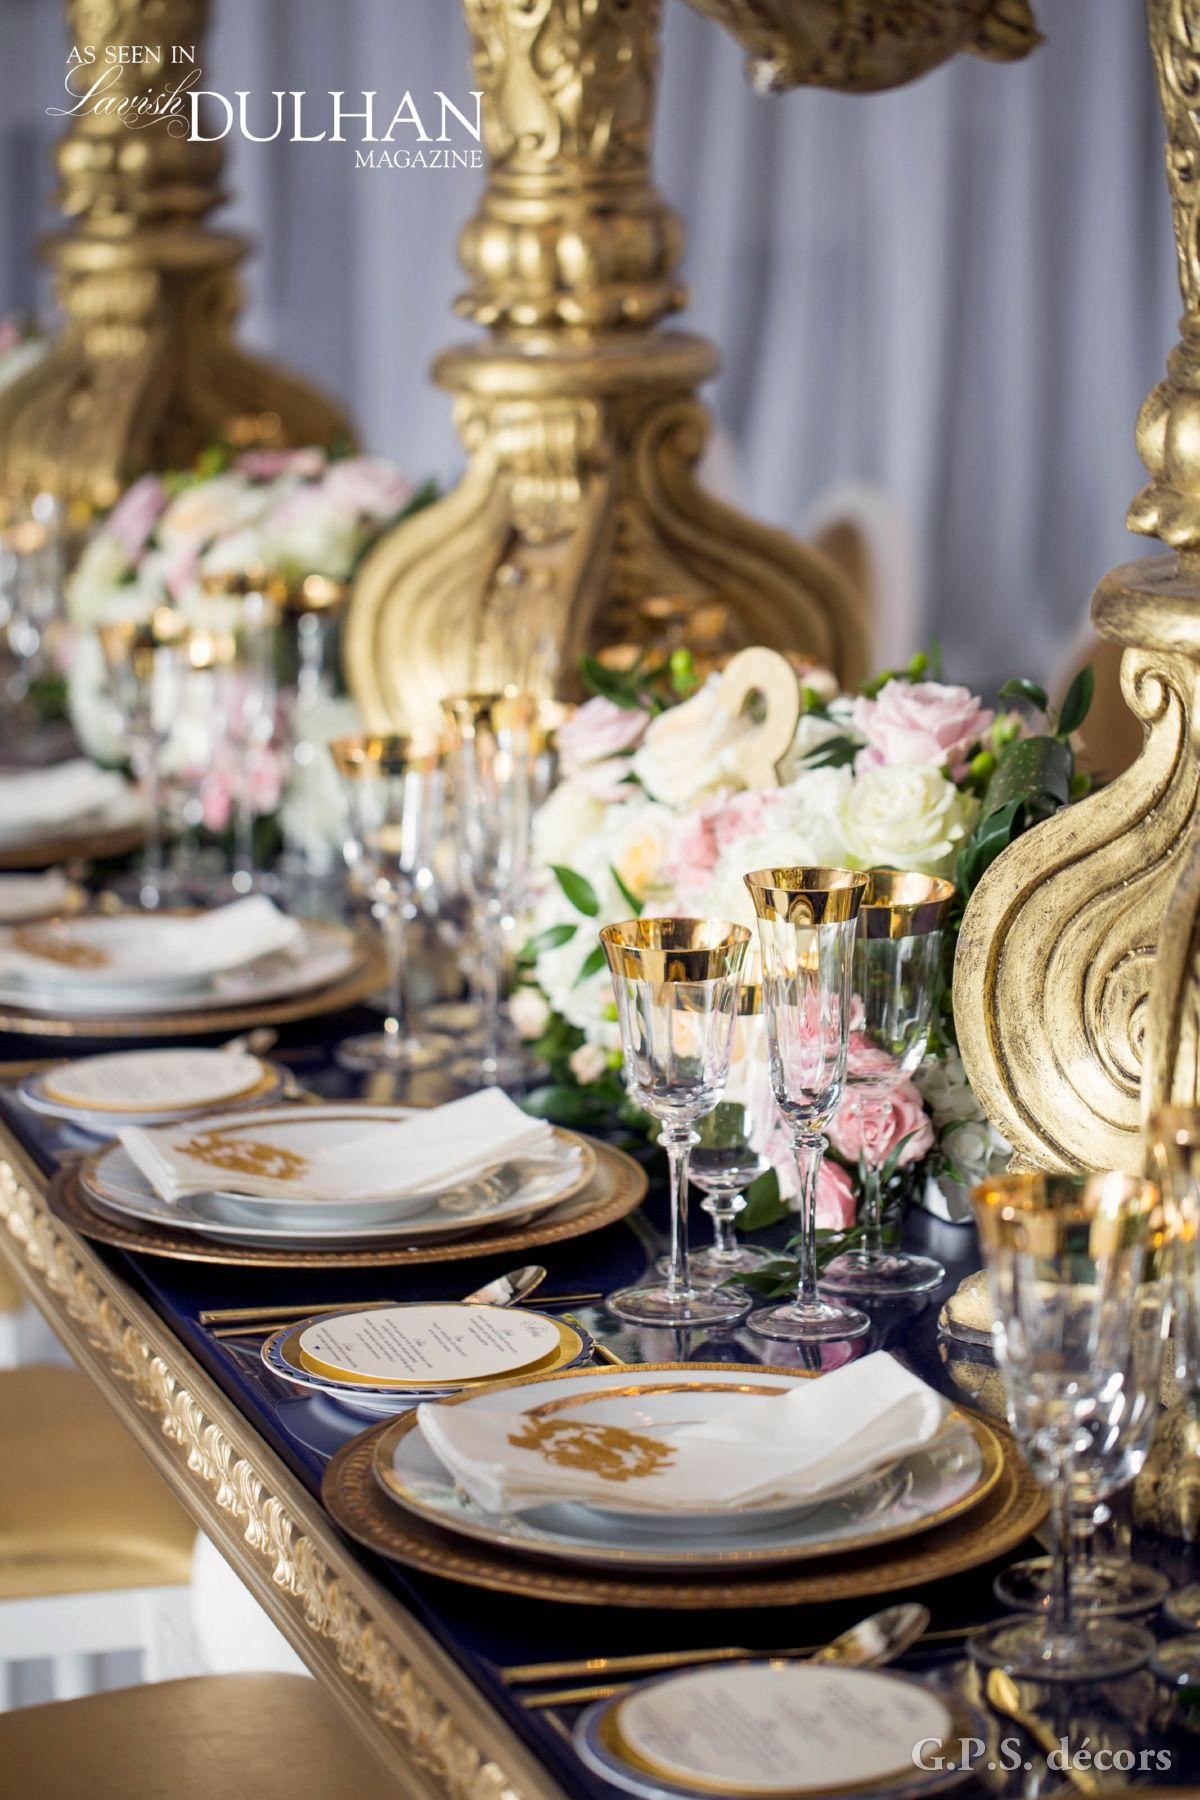 Wedding Centrepieces Brampton, Wedding Centrepieces Mississauga, Wedding Centrepieces Vaughan